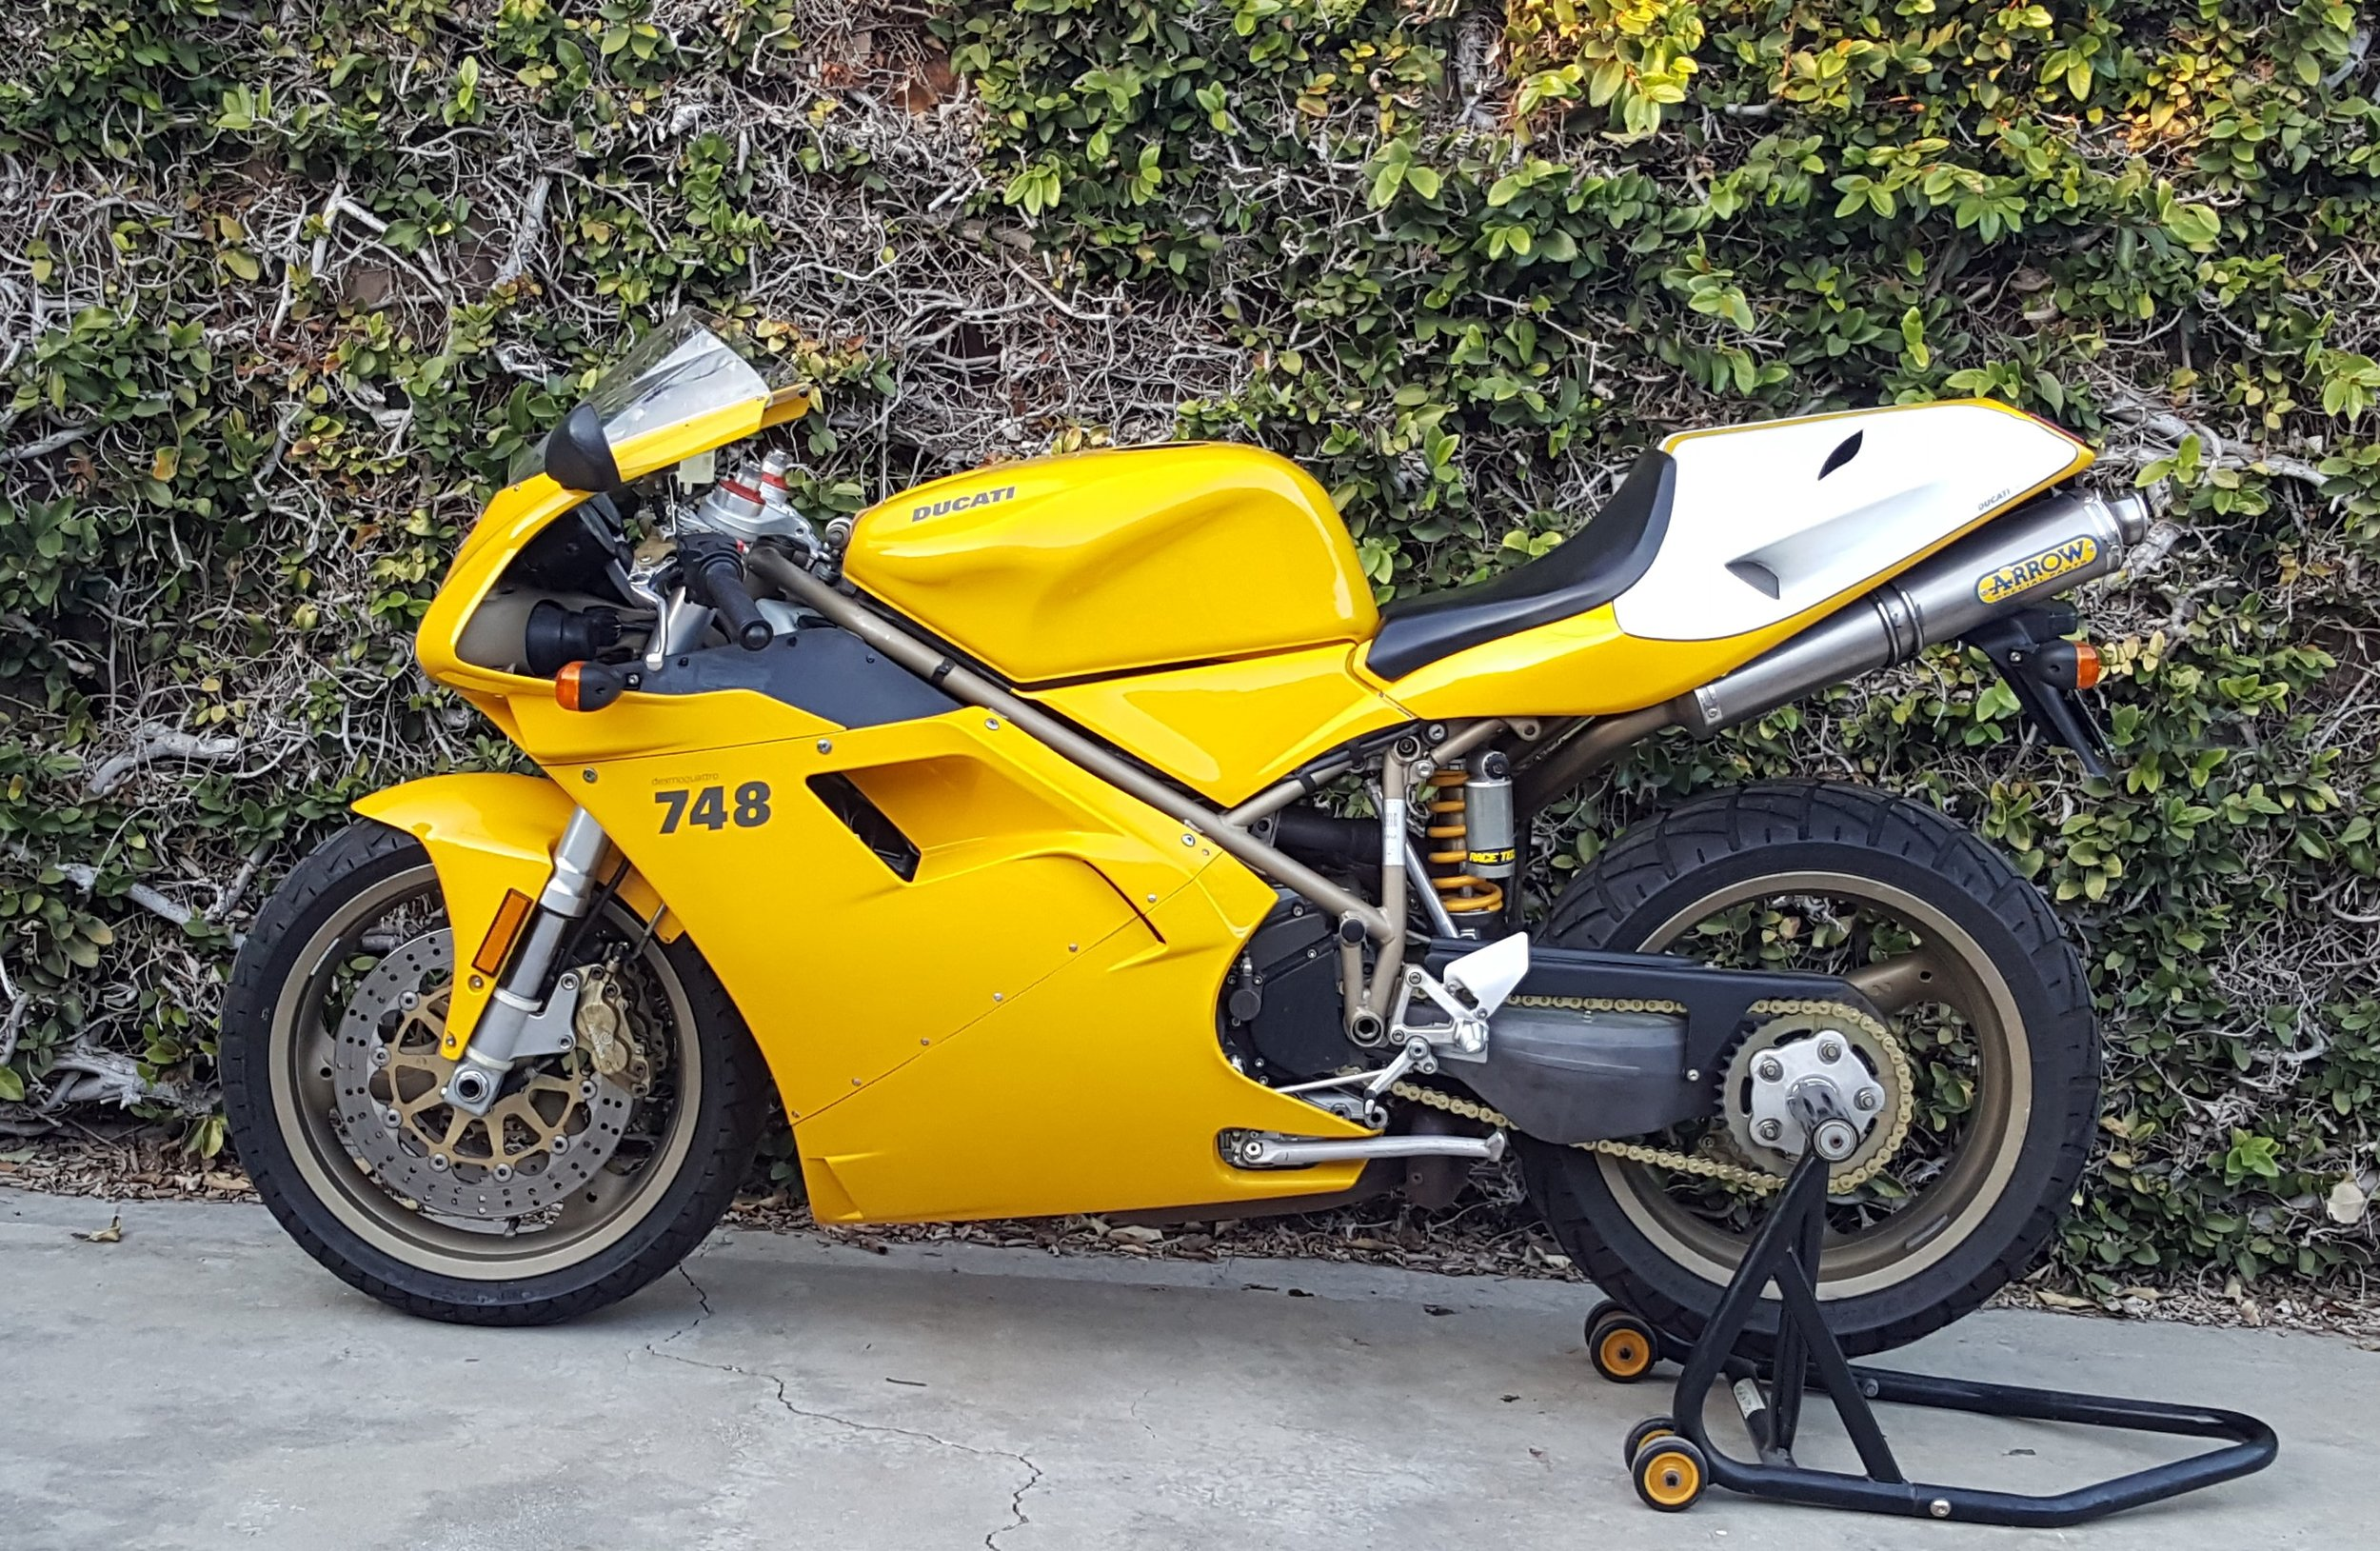 2000 Ducati 748-916 Restored3.jpg